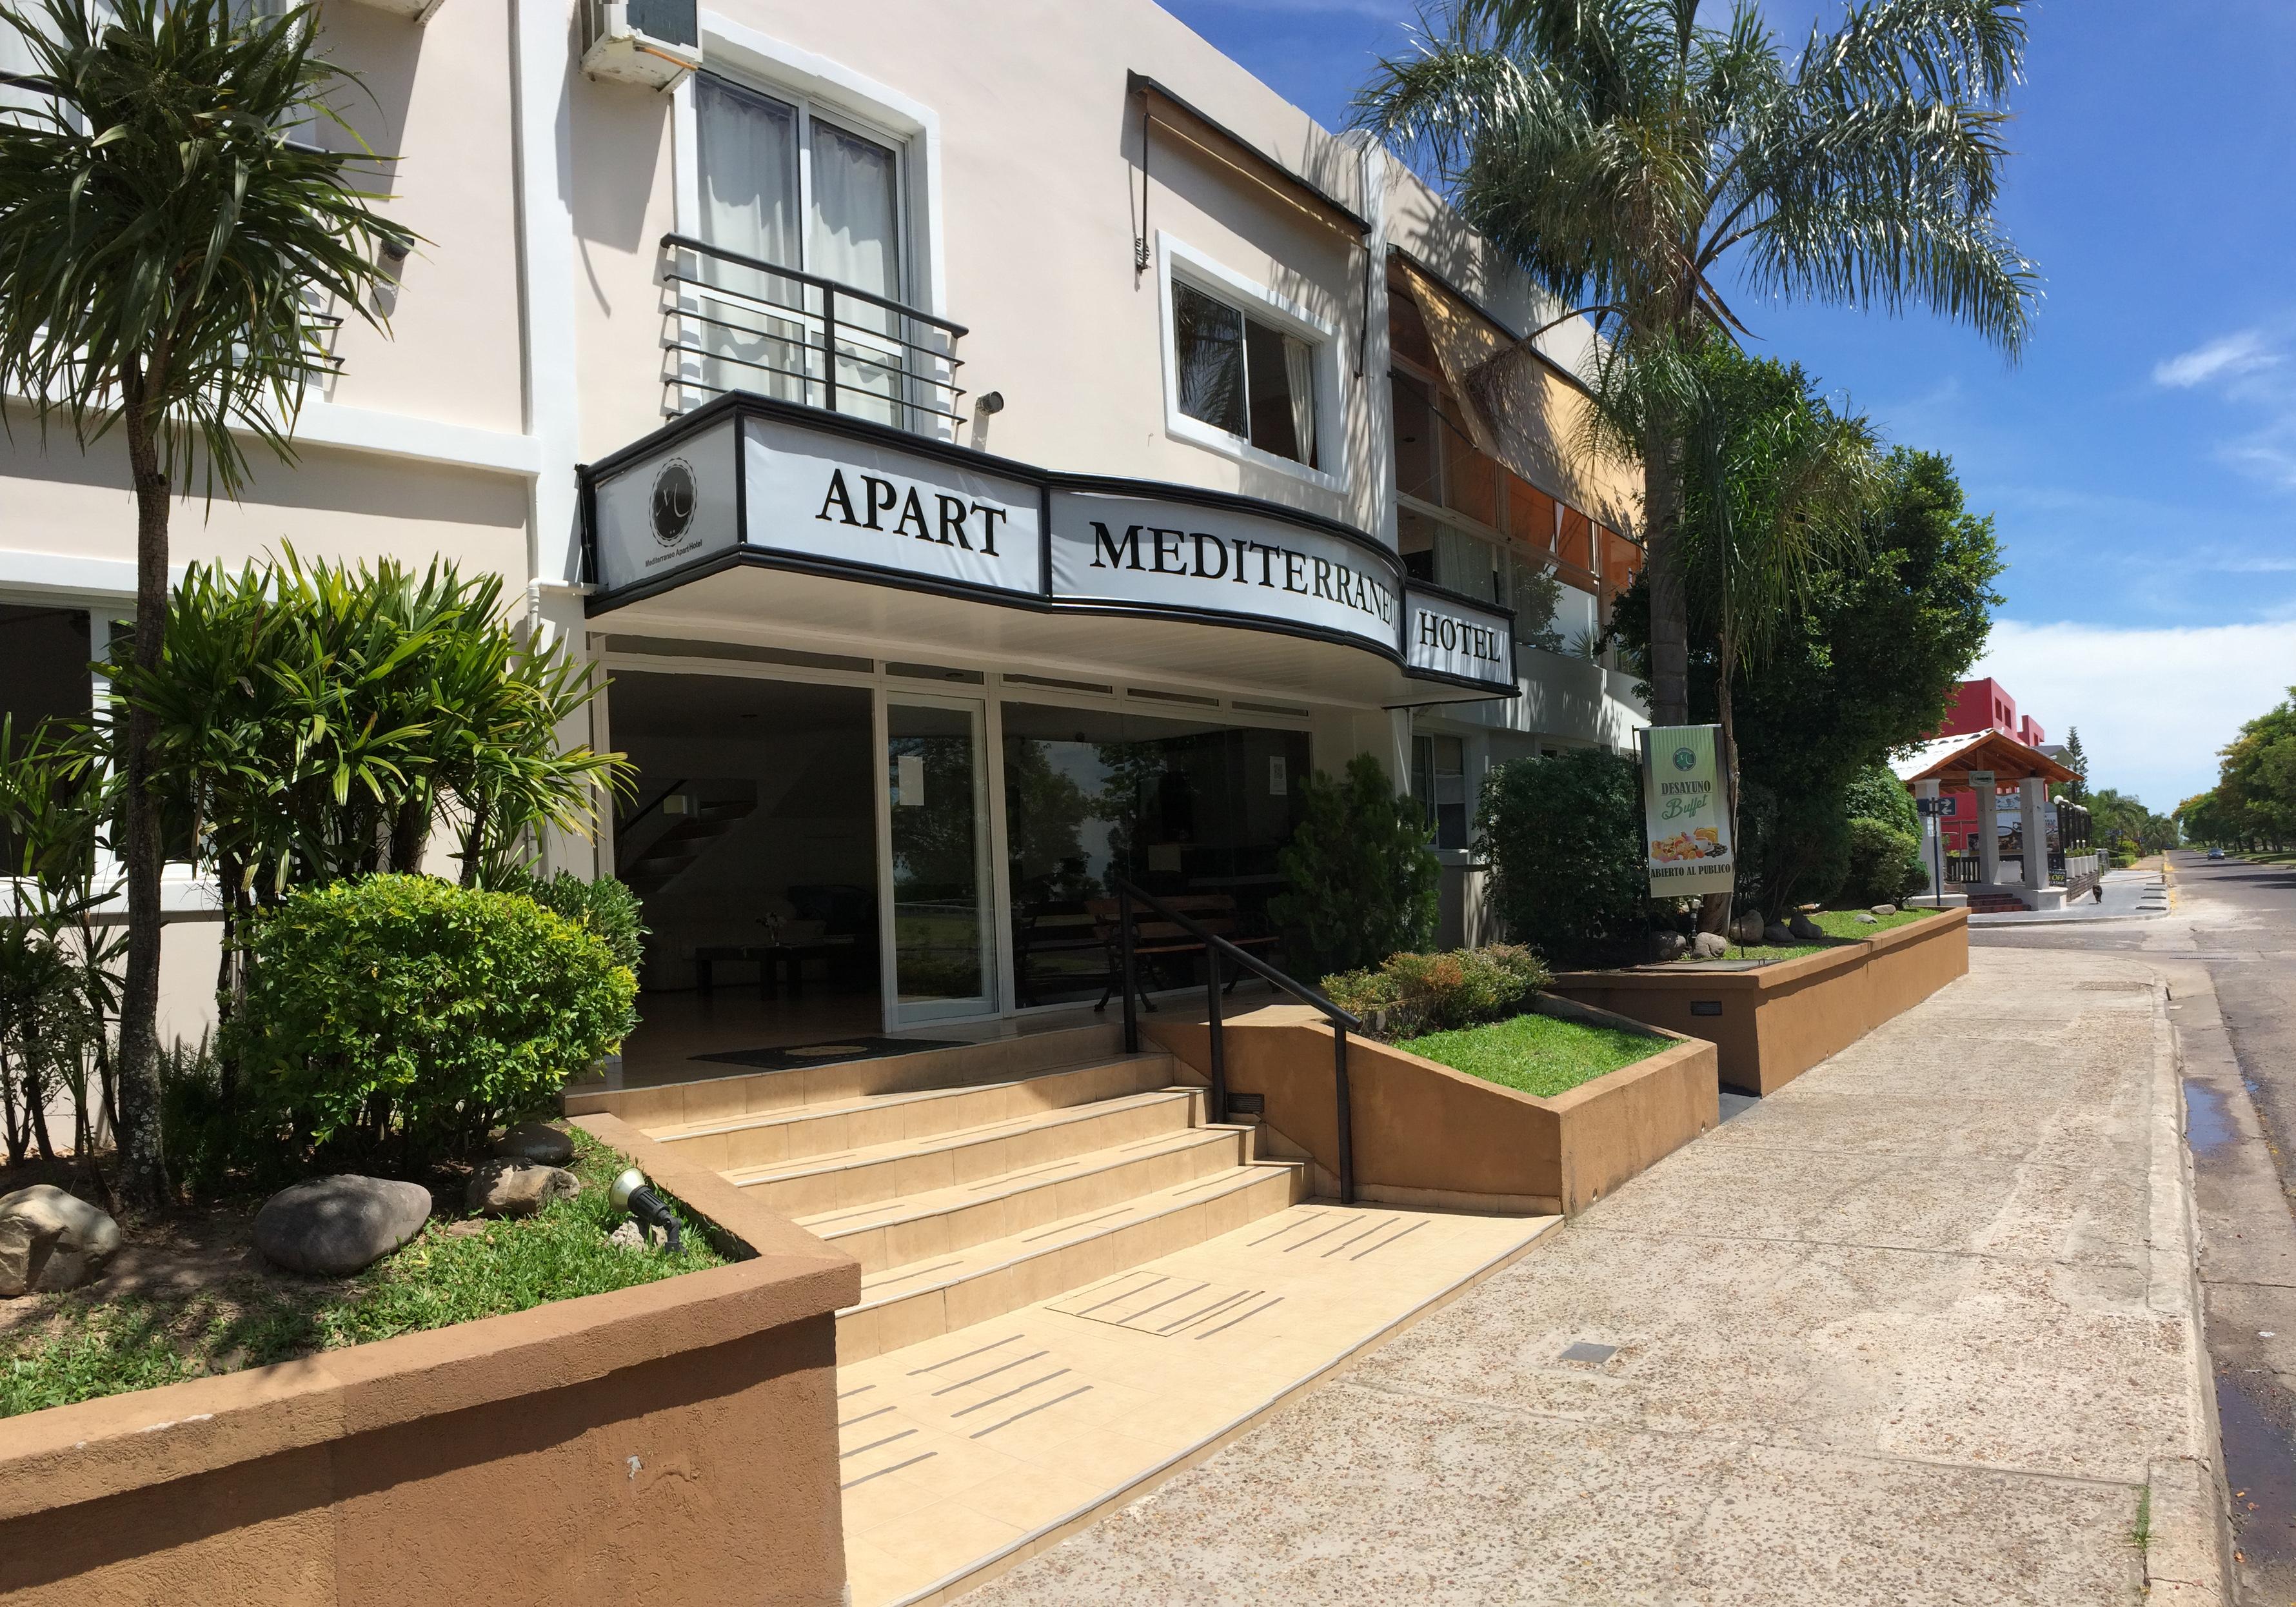 Mediterraneo apart hotel federacion for Appart hotel urban lodge chaudfontaine